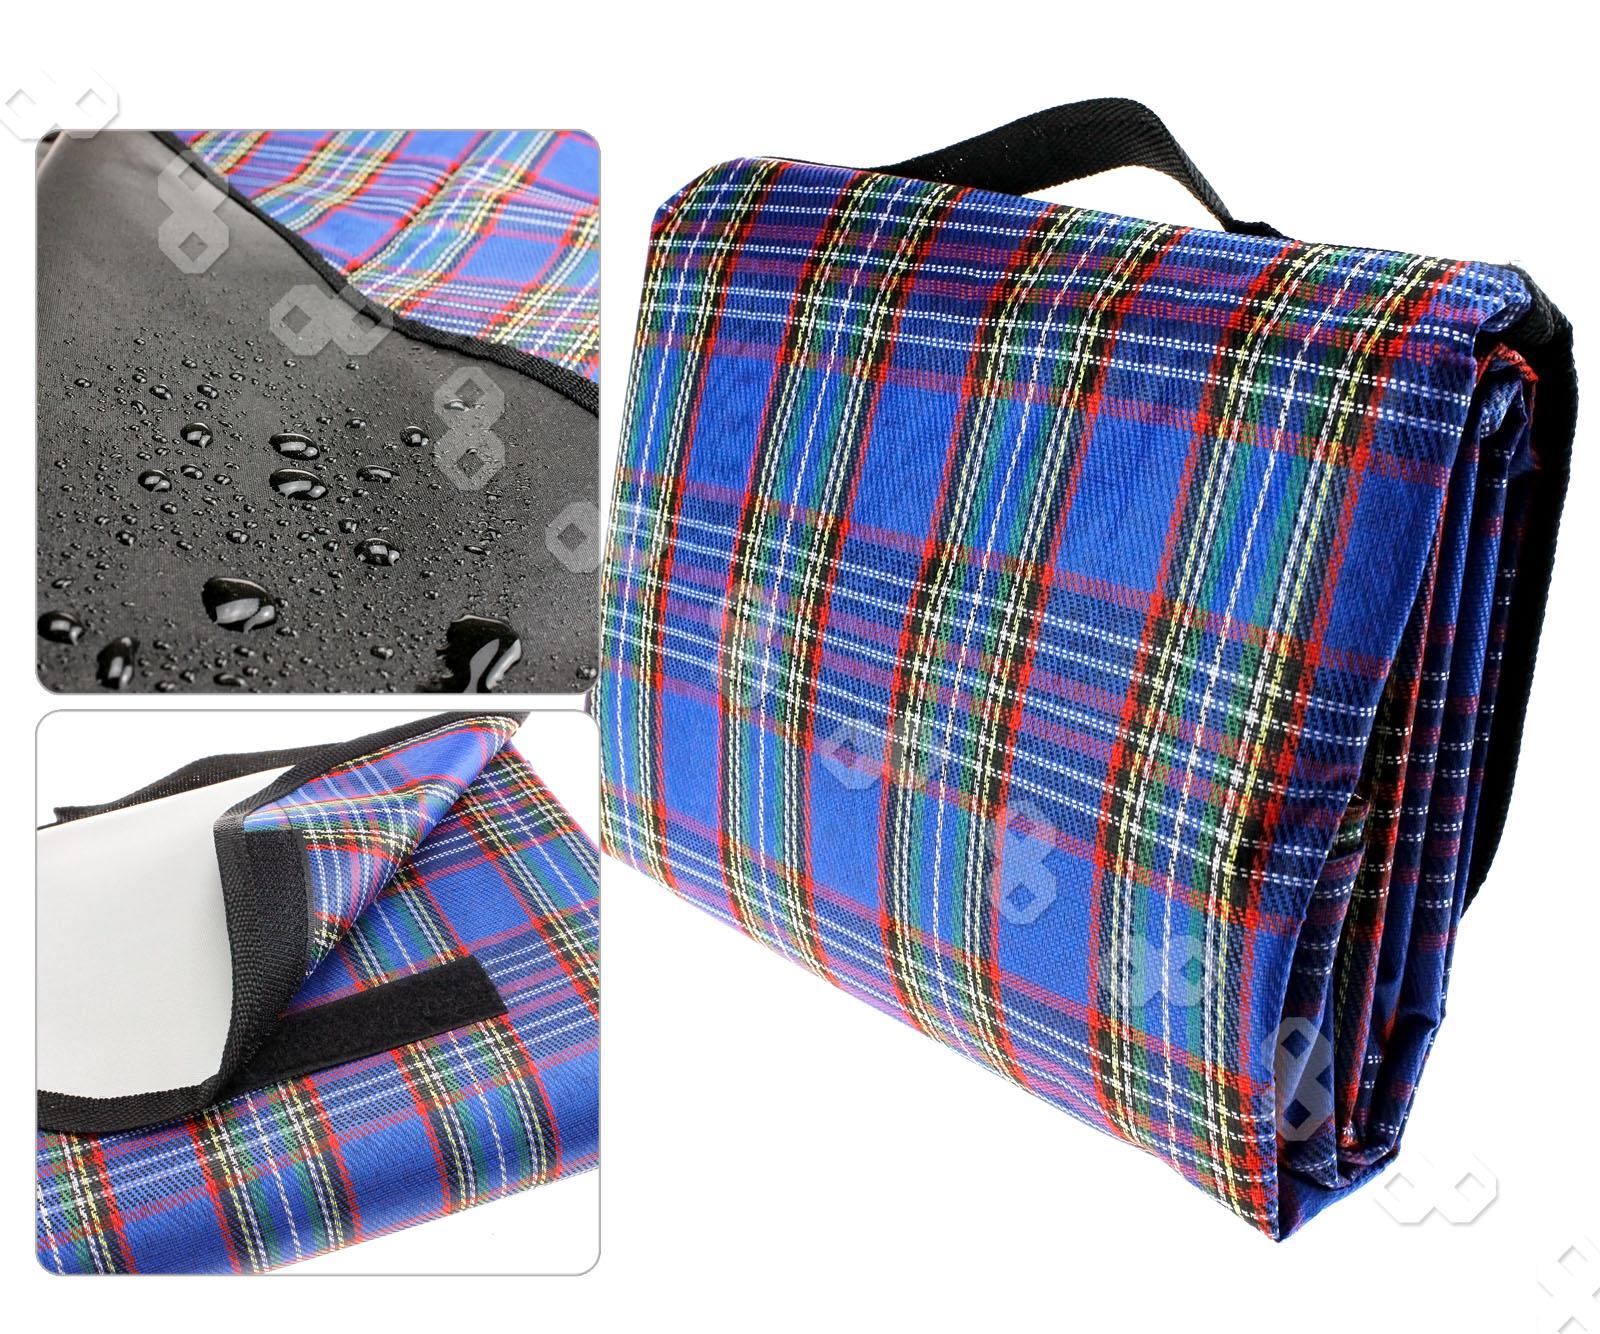 "Picnic Blanket: Blue 57x76"" Waterproof Picnic Blanket Rug Travel Camping"